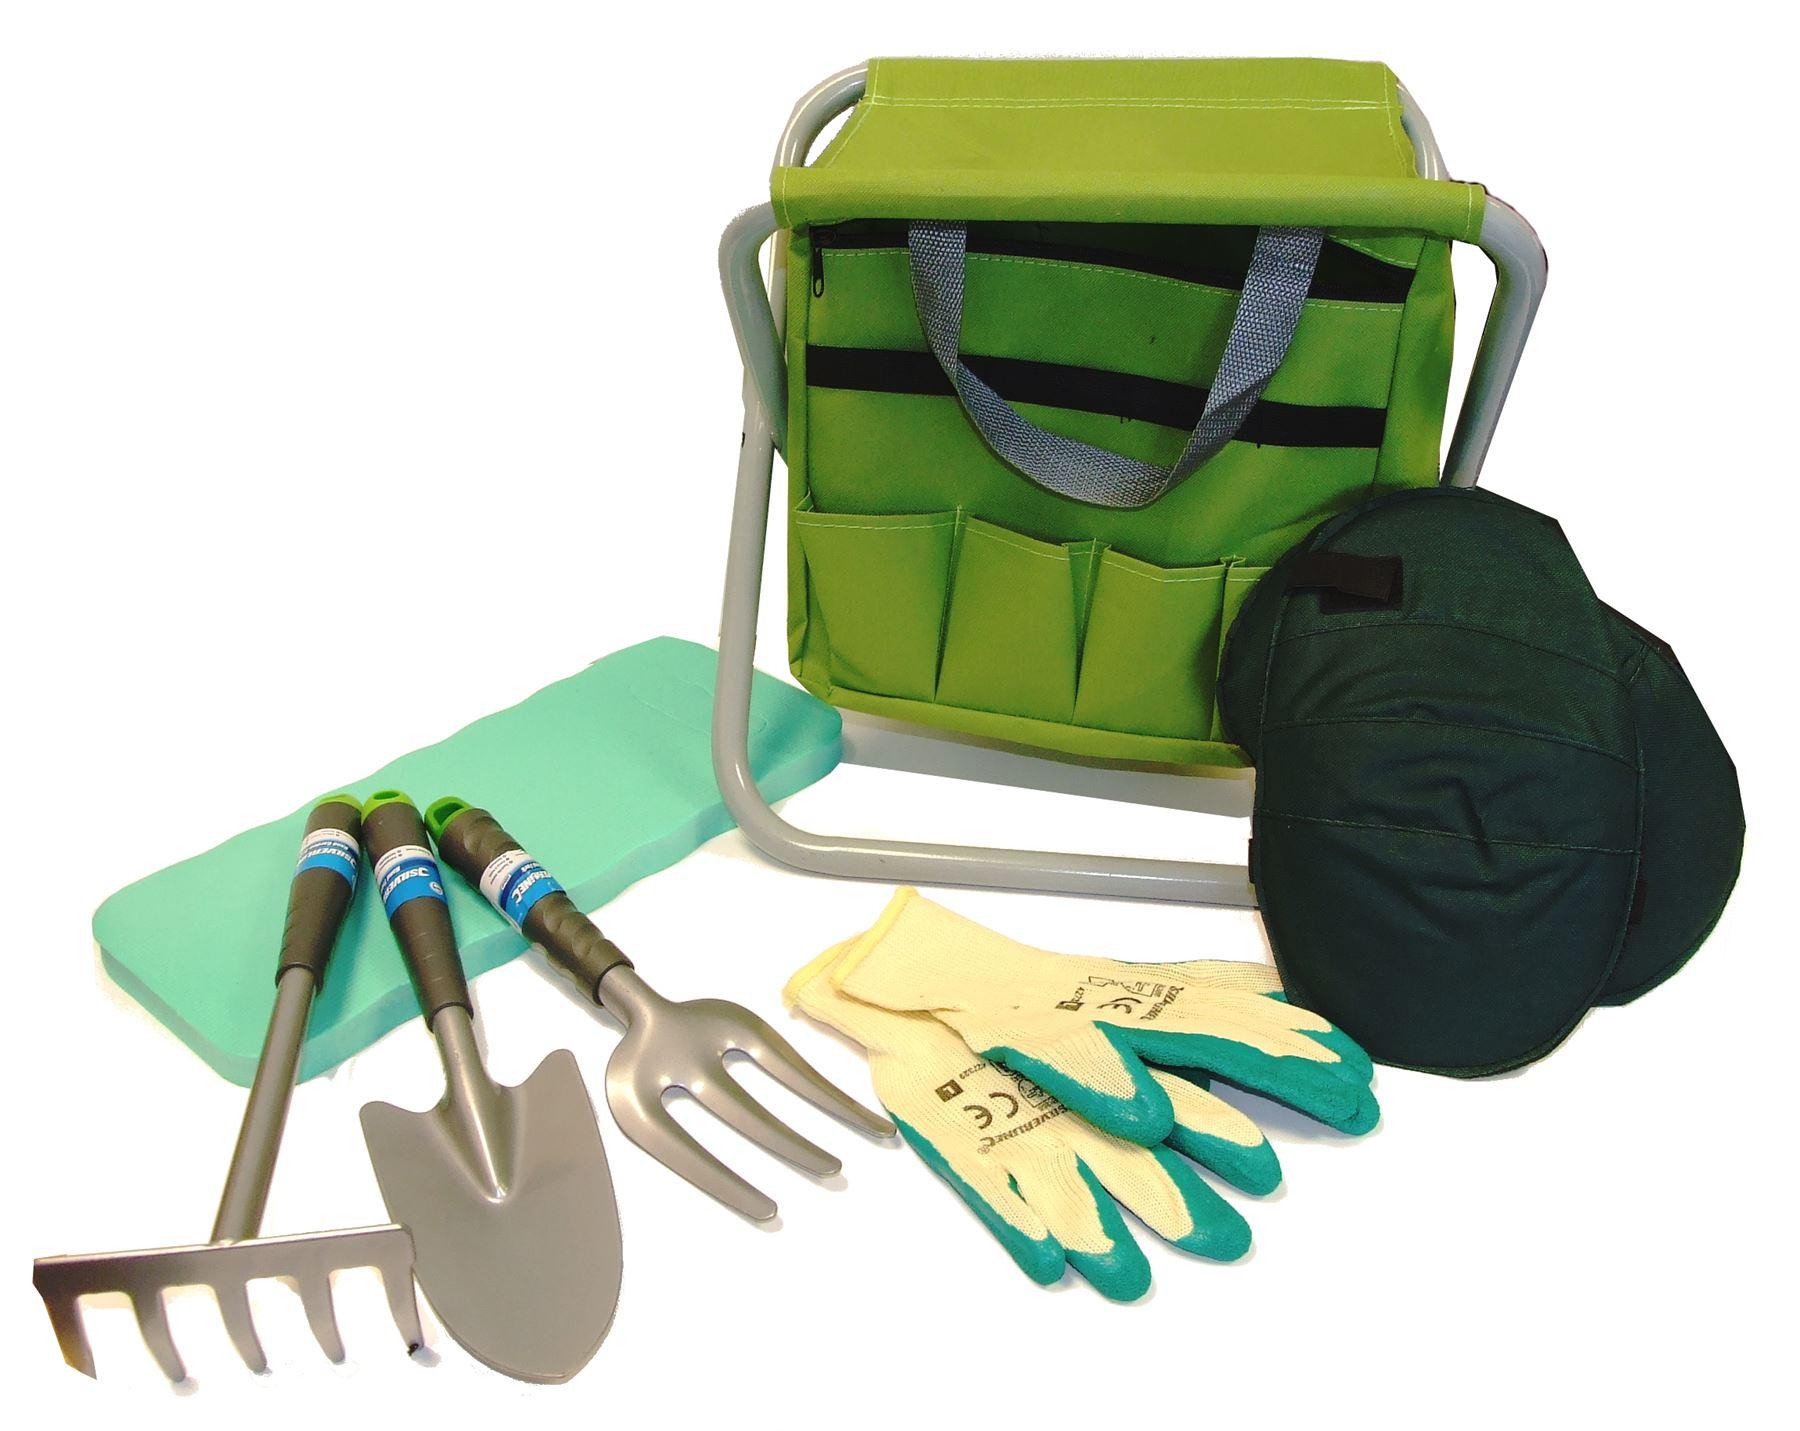 Gardening Planting Hand Tools Set And Tool Bag Stool Knee